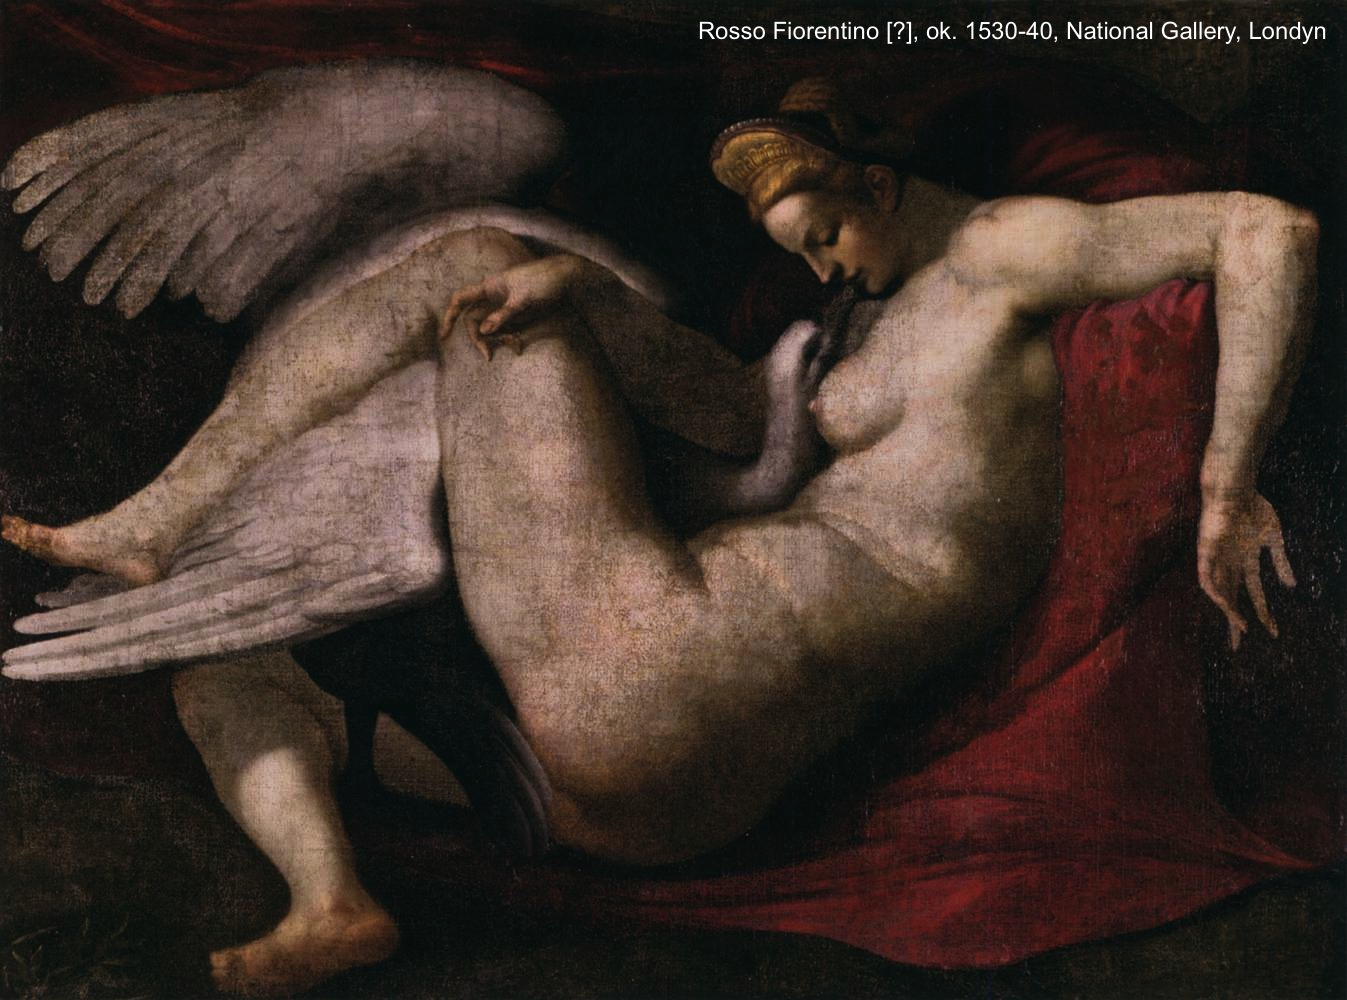 Michelangelo_Buonarroti_-_Leda_and_the_Swan_-_WGA15230